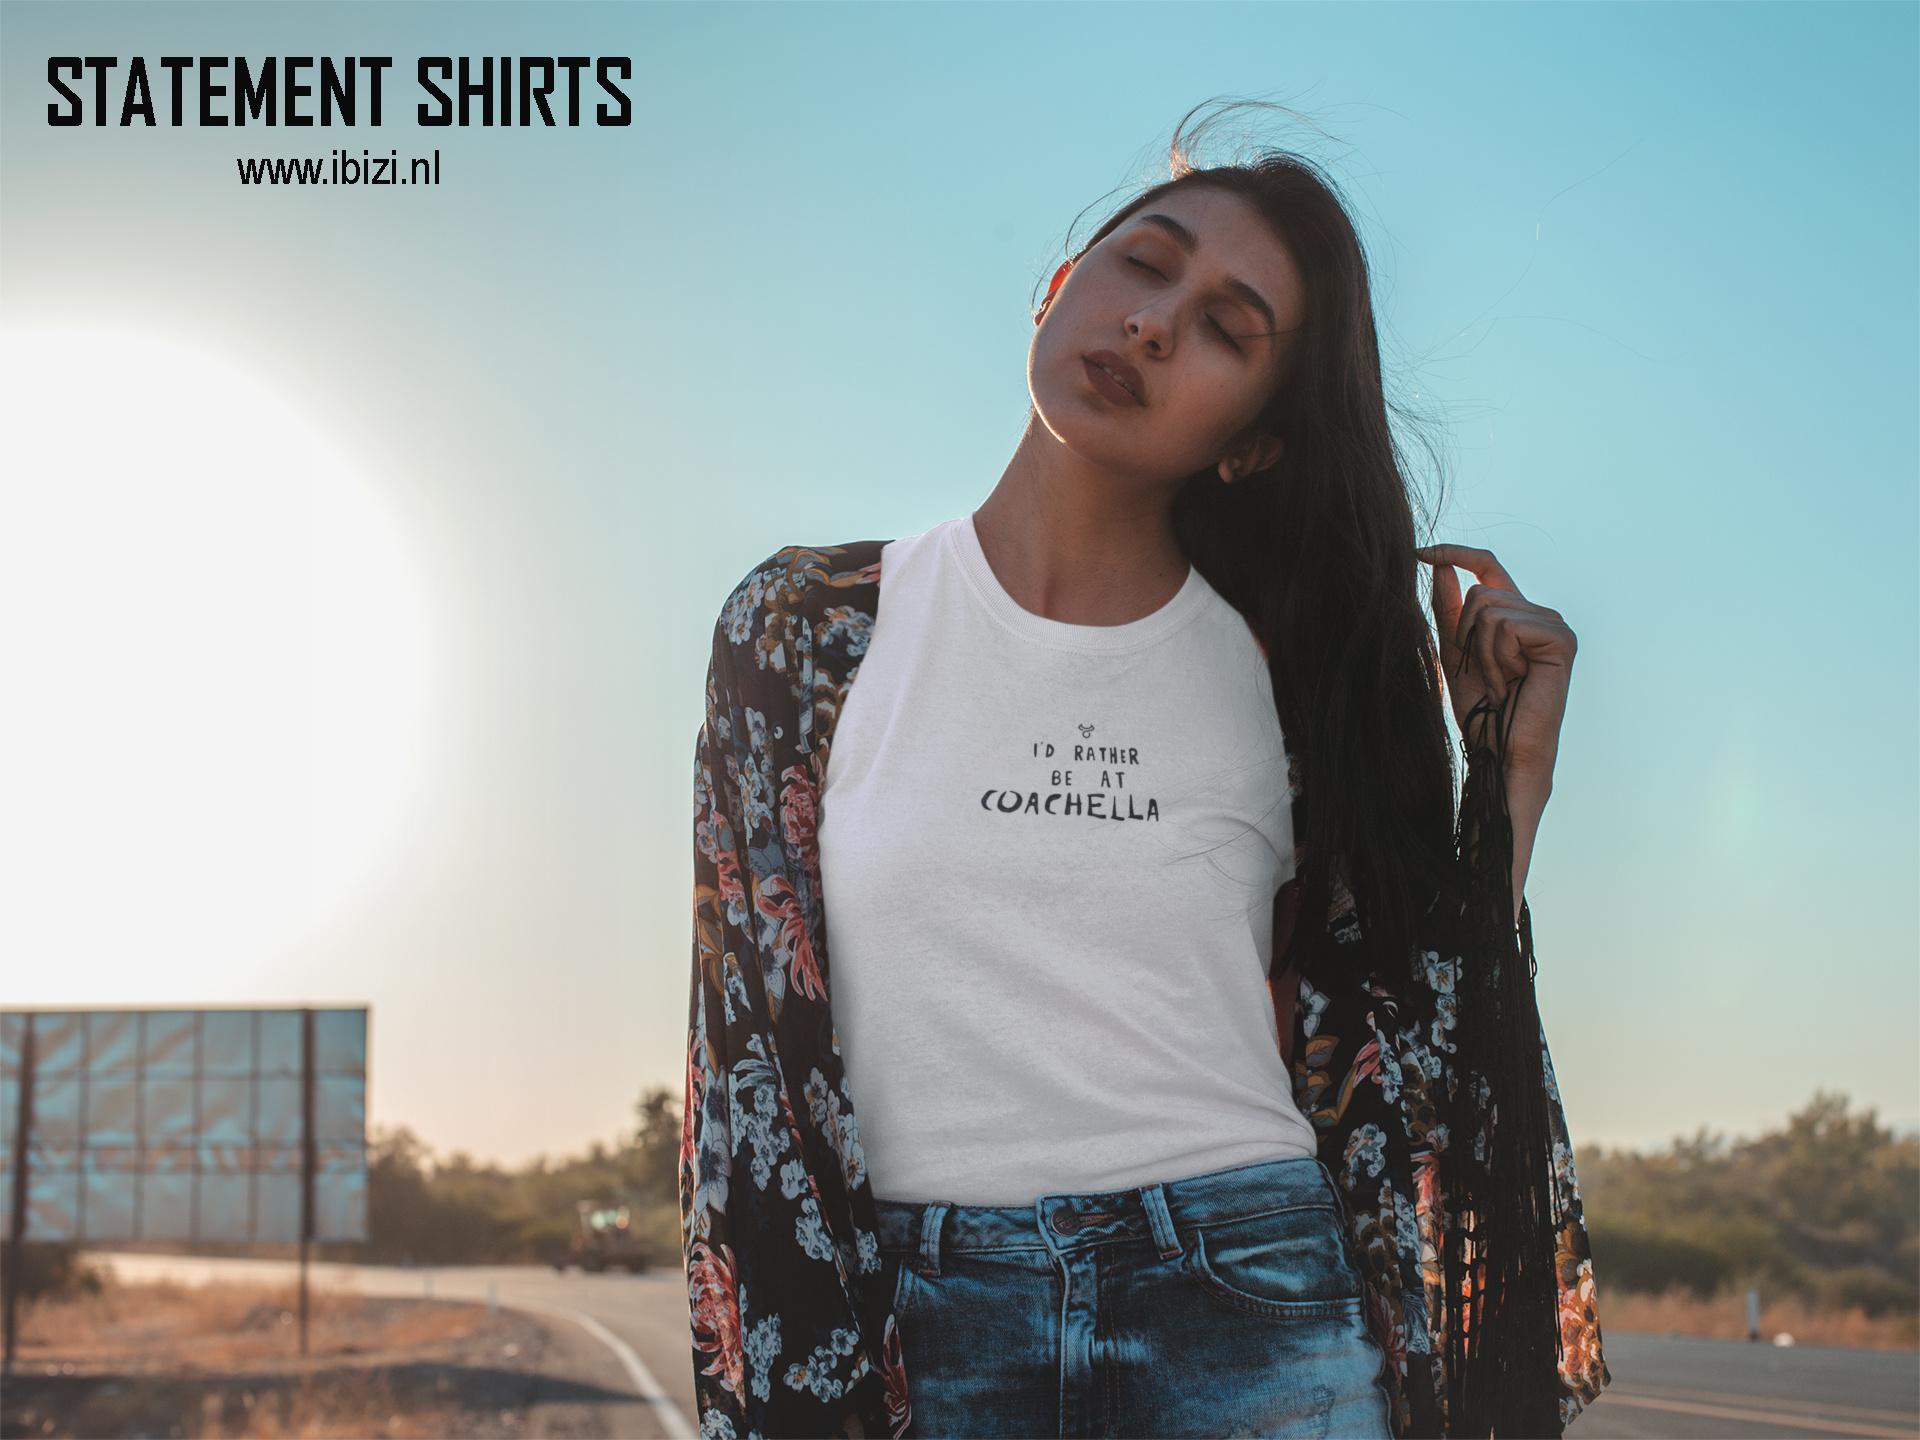 Statement Shirts - Dames T-Shirts Met Tekst - Slogan - Quote